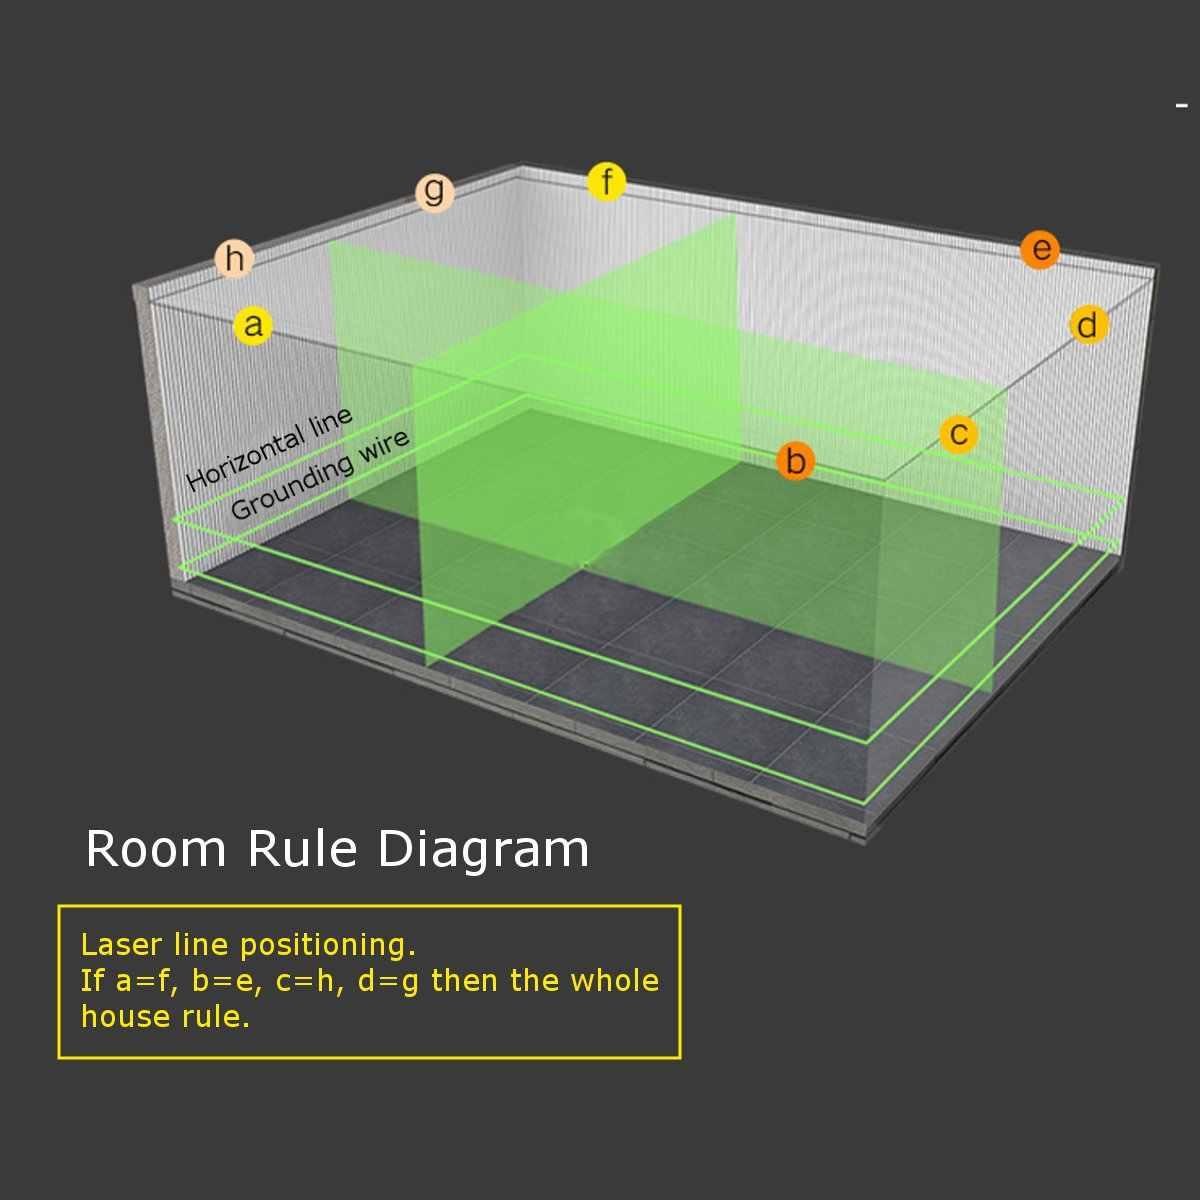 [SCHEMATICS_4HG]  16 Lines 4D Laser Level Green Laser Line Self Leveling 360 Degree  Horizontal & Vertical Powerful Cross Lines Outdoor| | - AliExpress | Laser Level 360 Wire Diagram |  | AliExpress